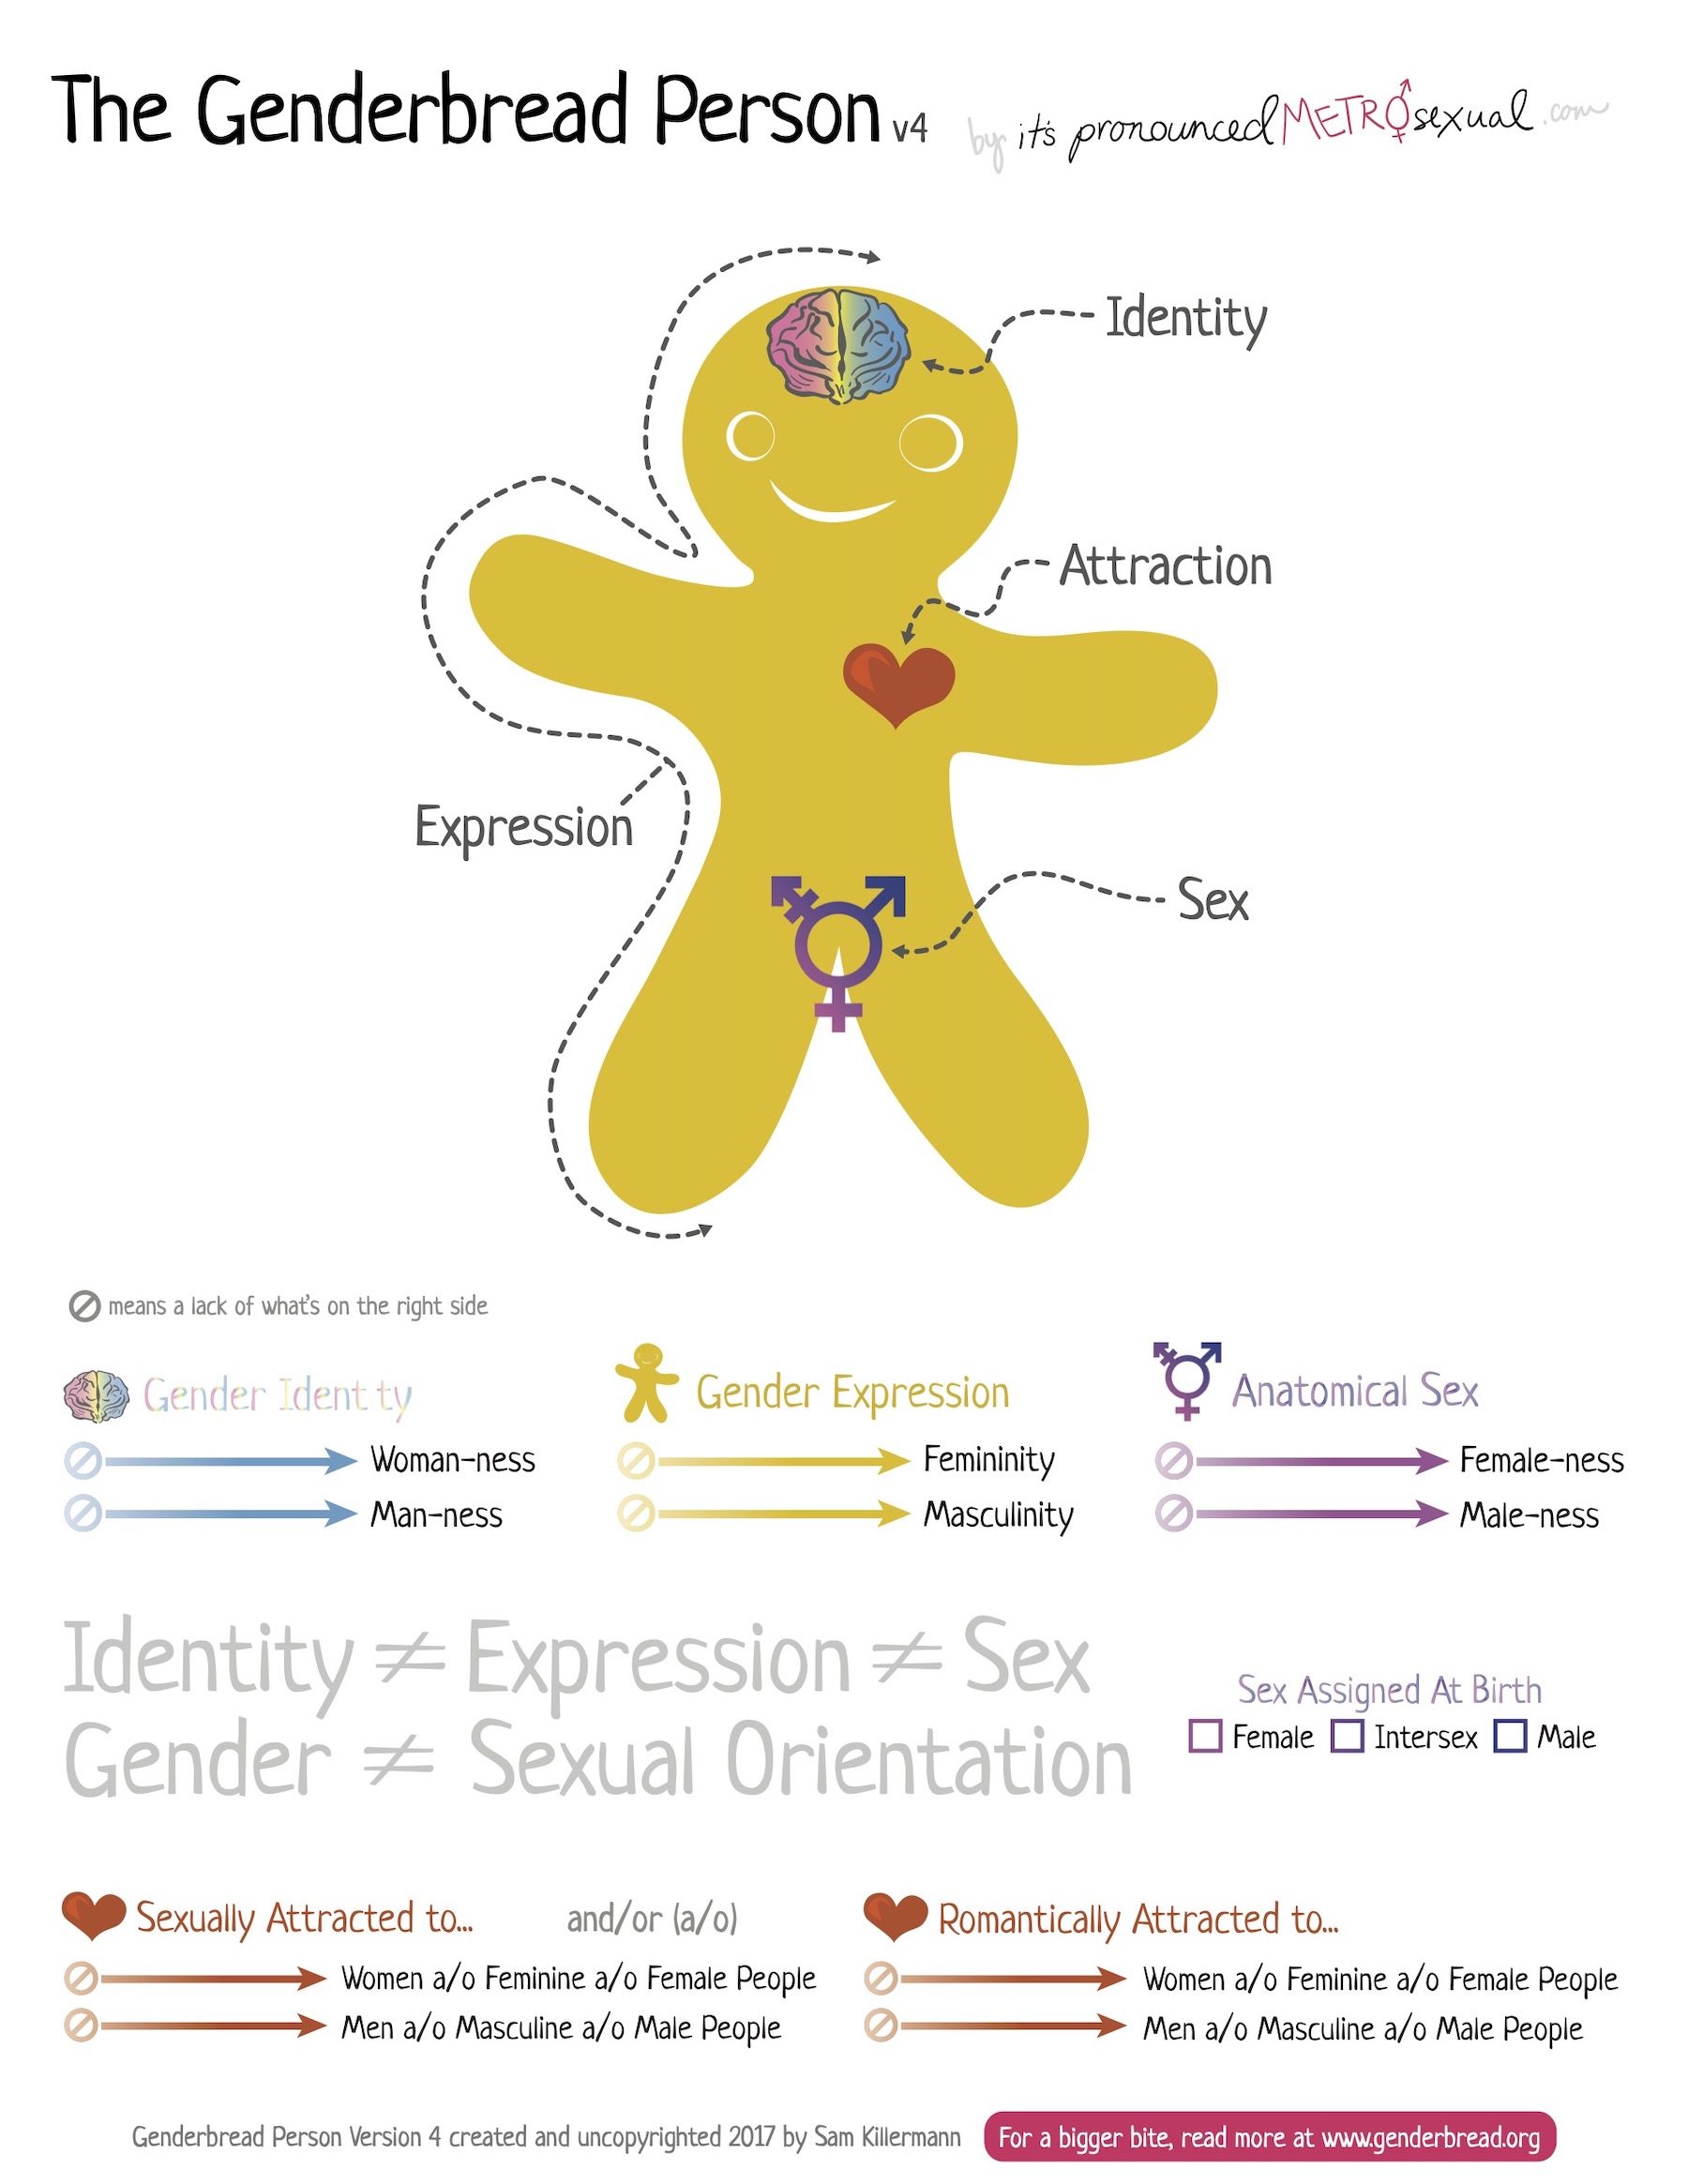 The Genderbread Person